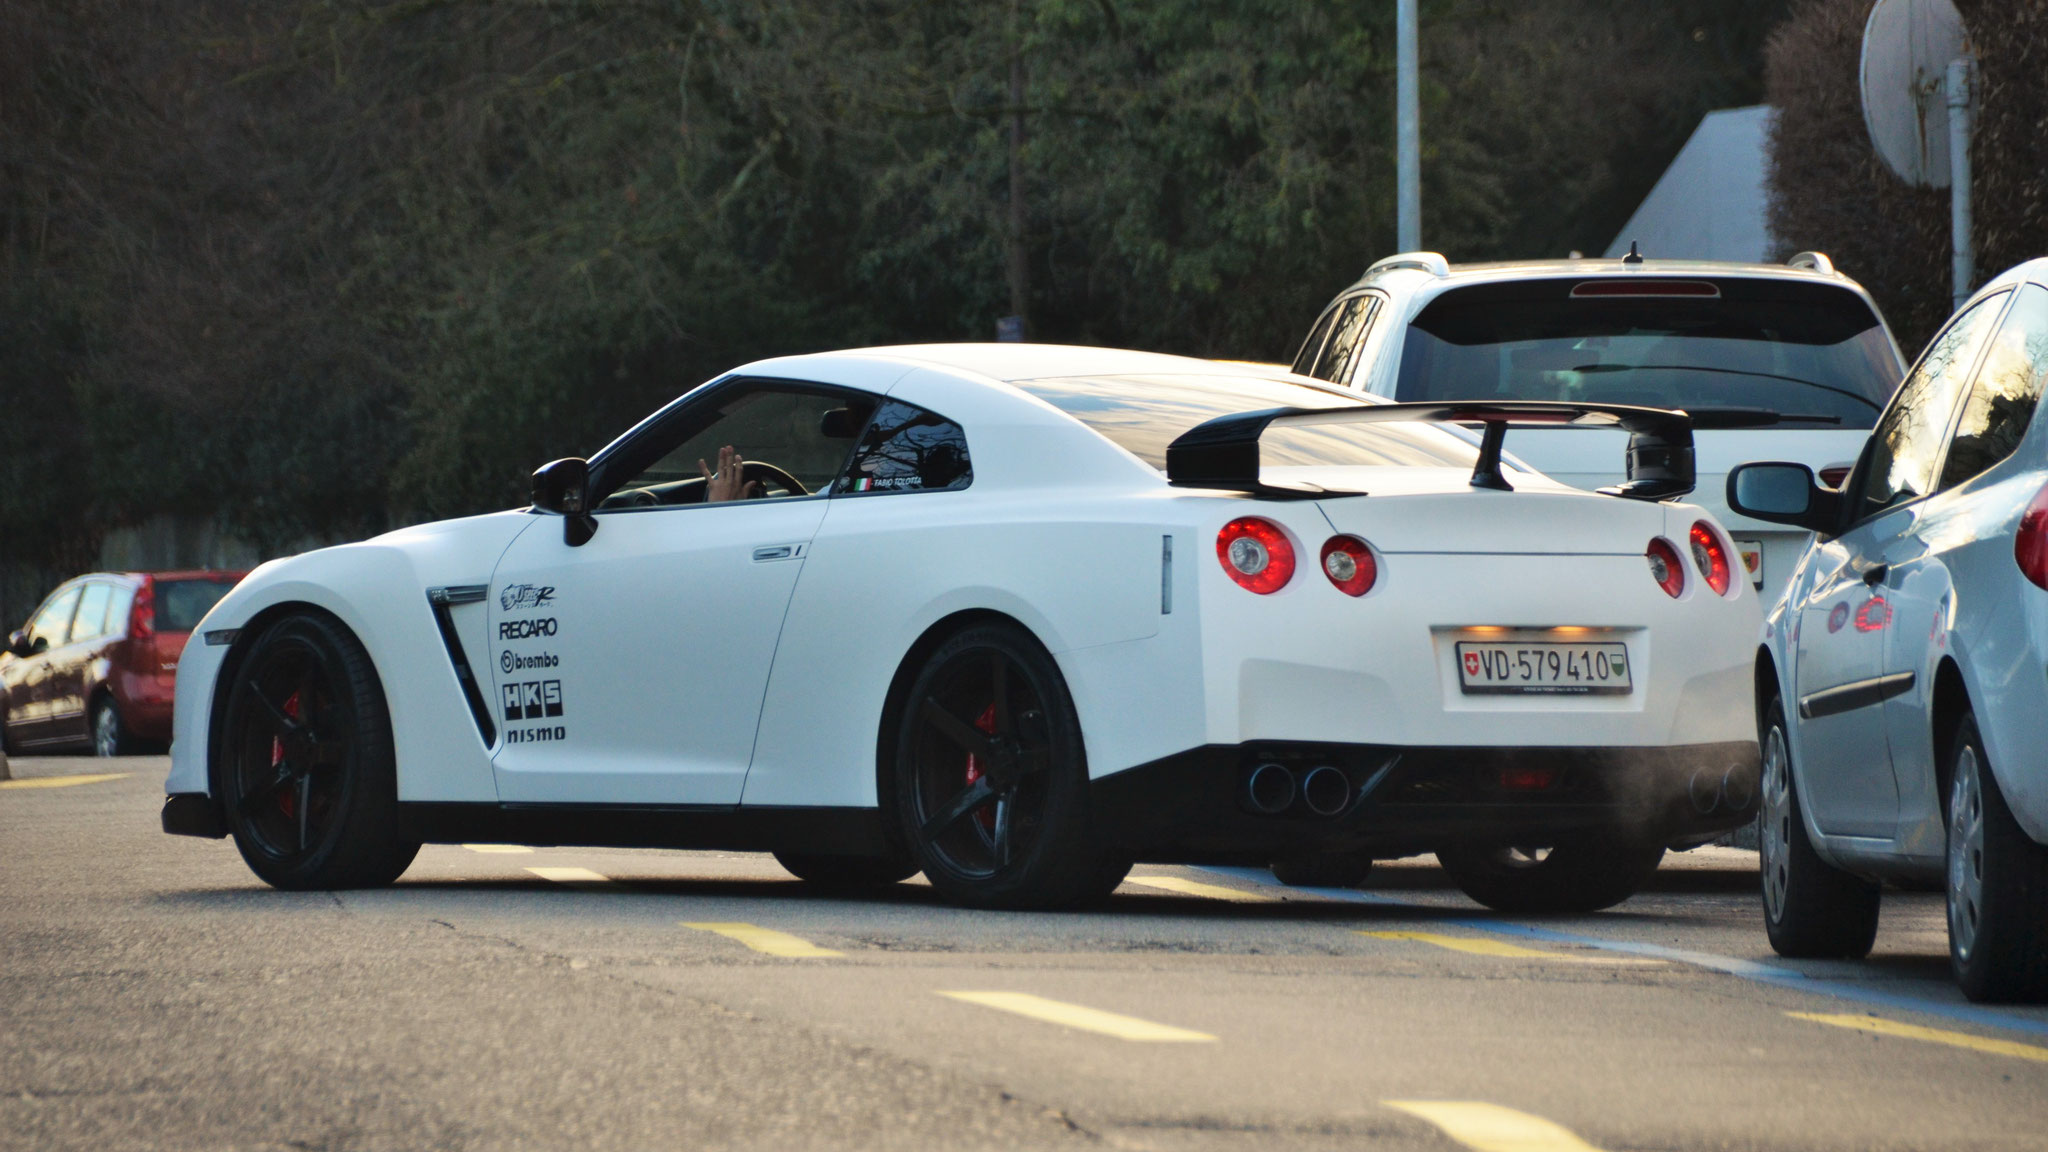 Nissan GTR - VD-579410